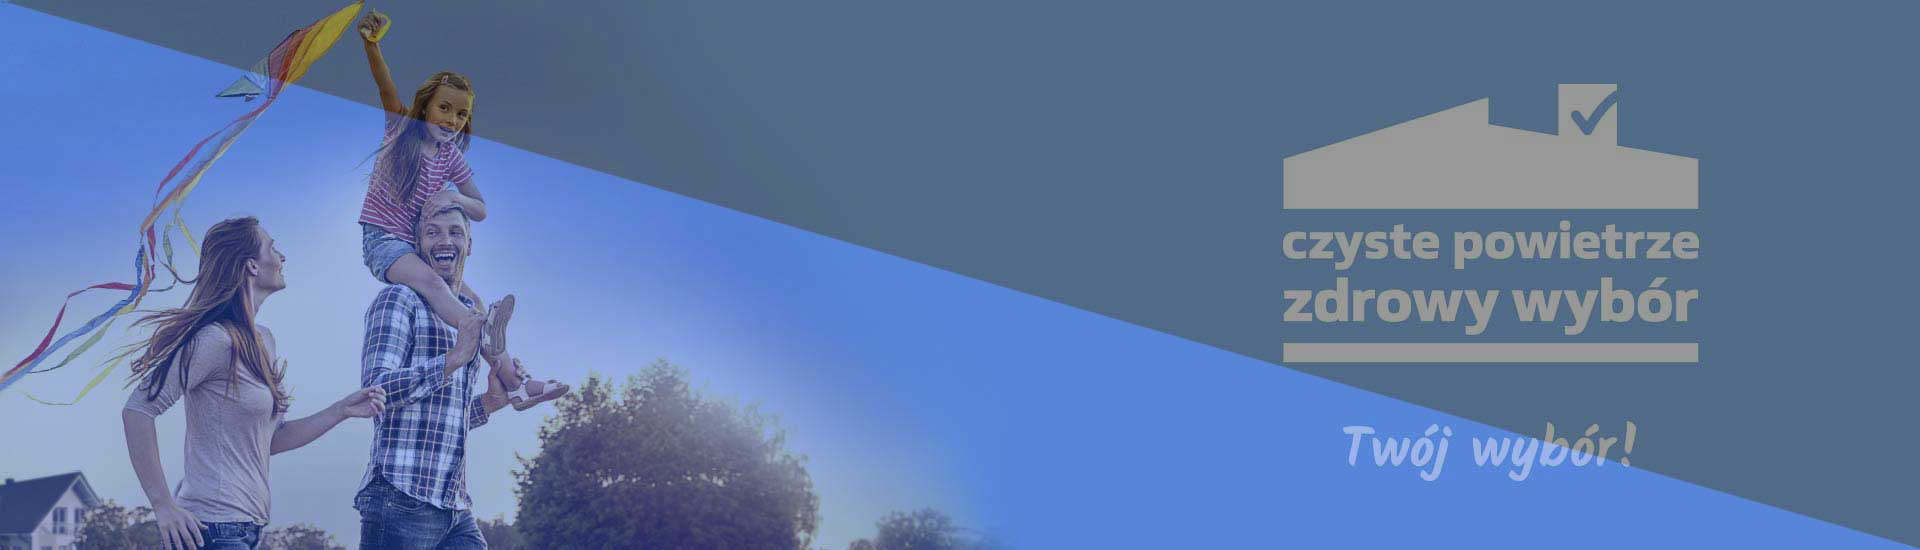 baner-sklep2.jpg